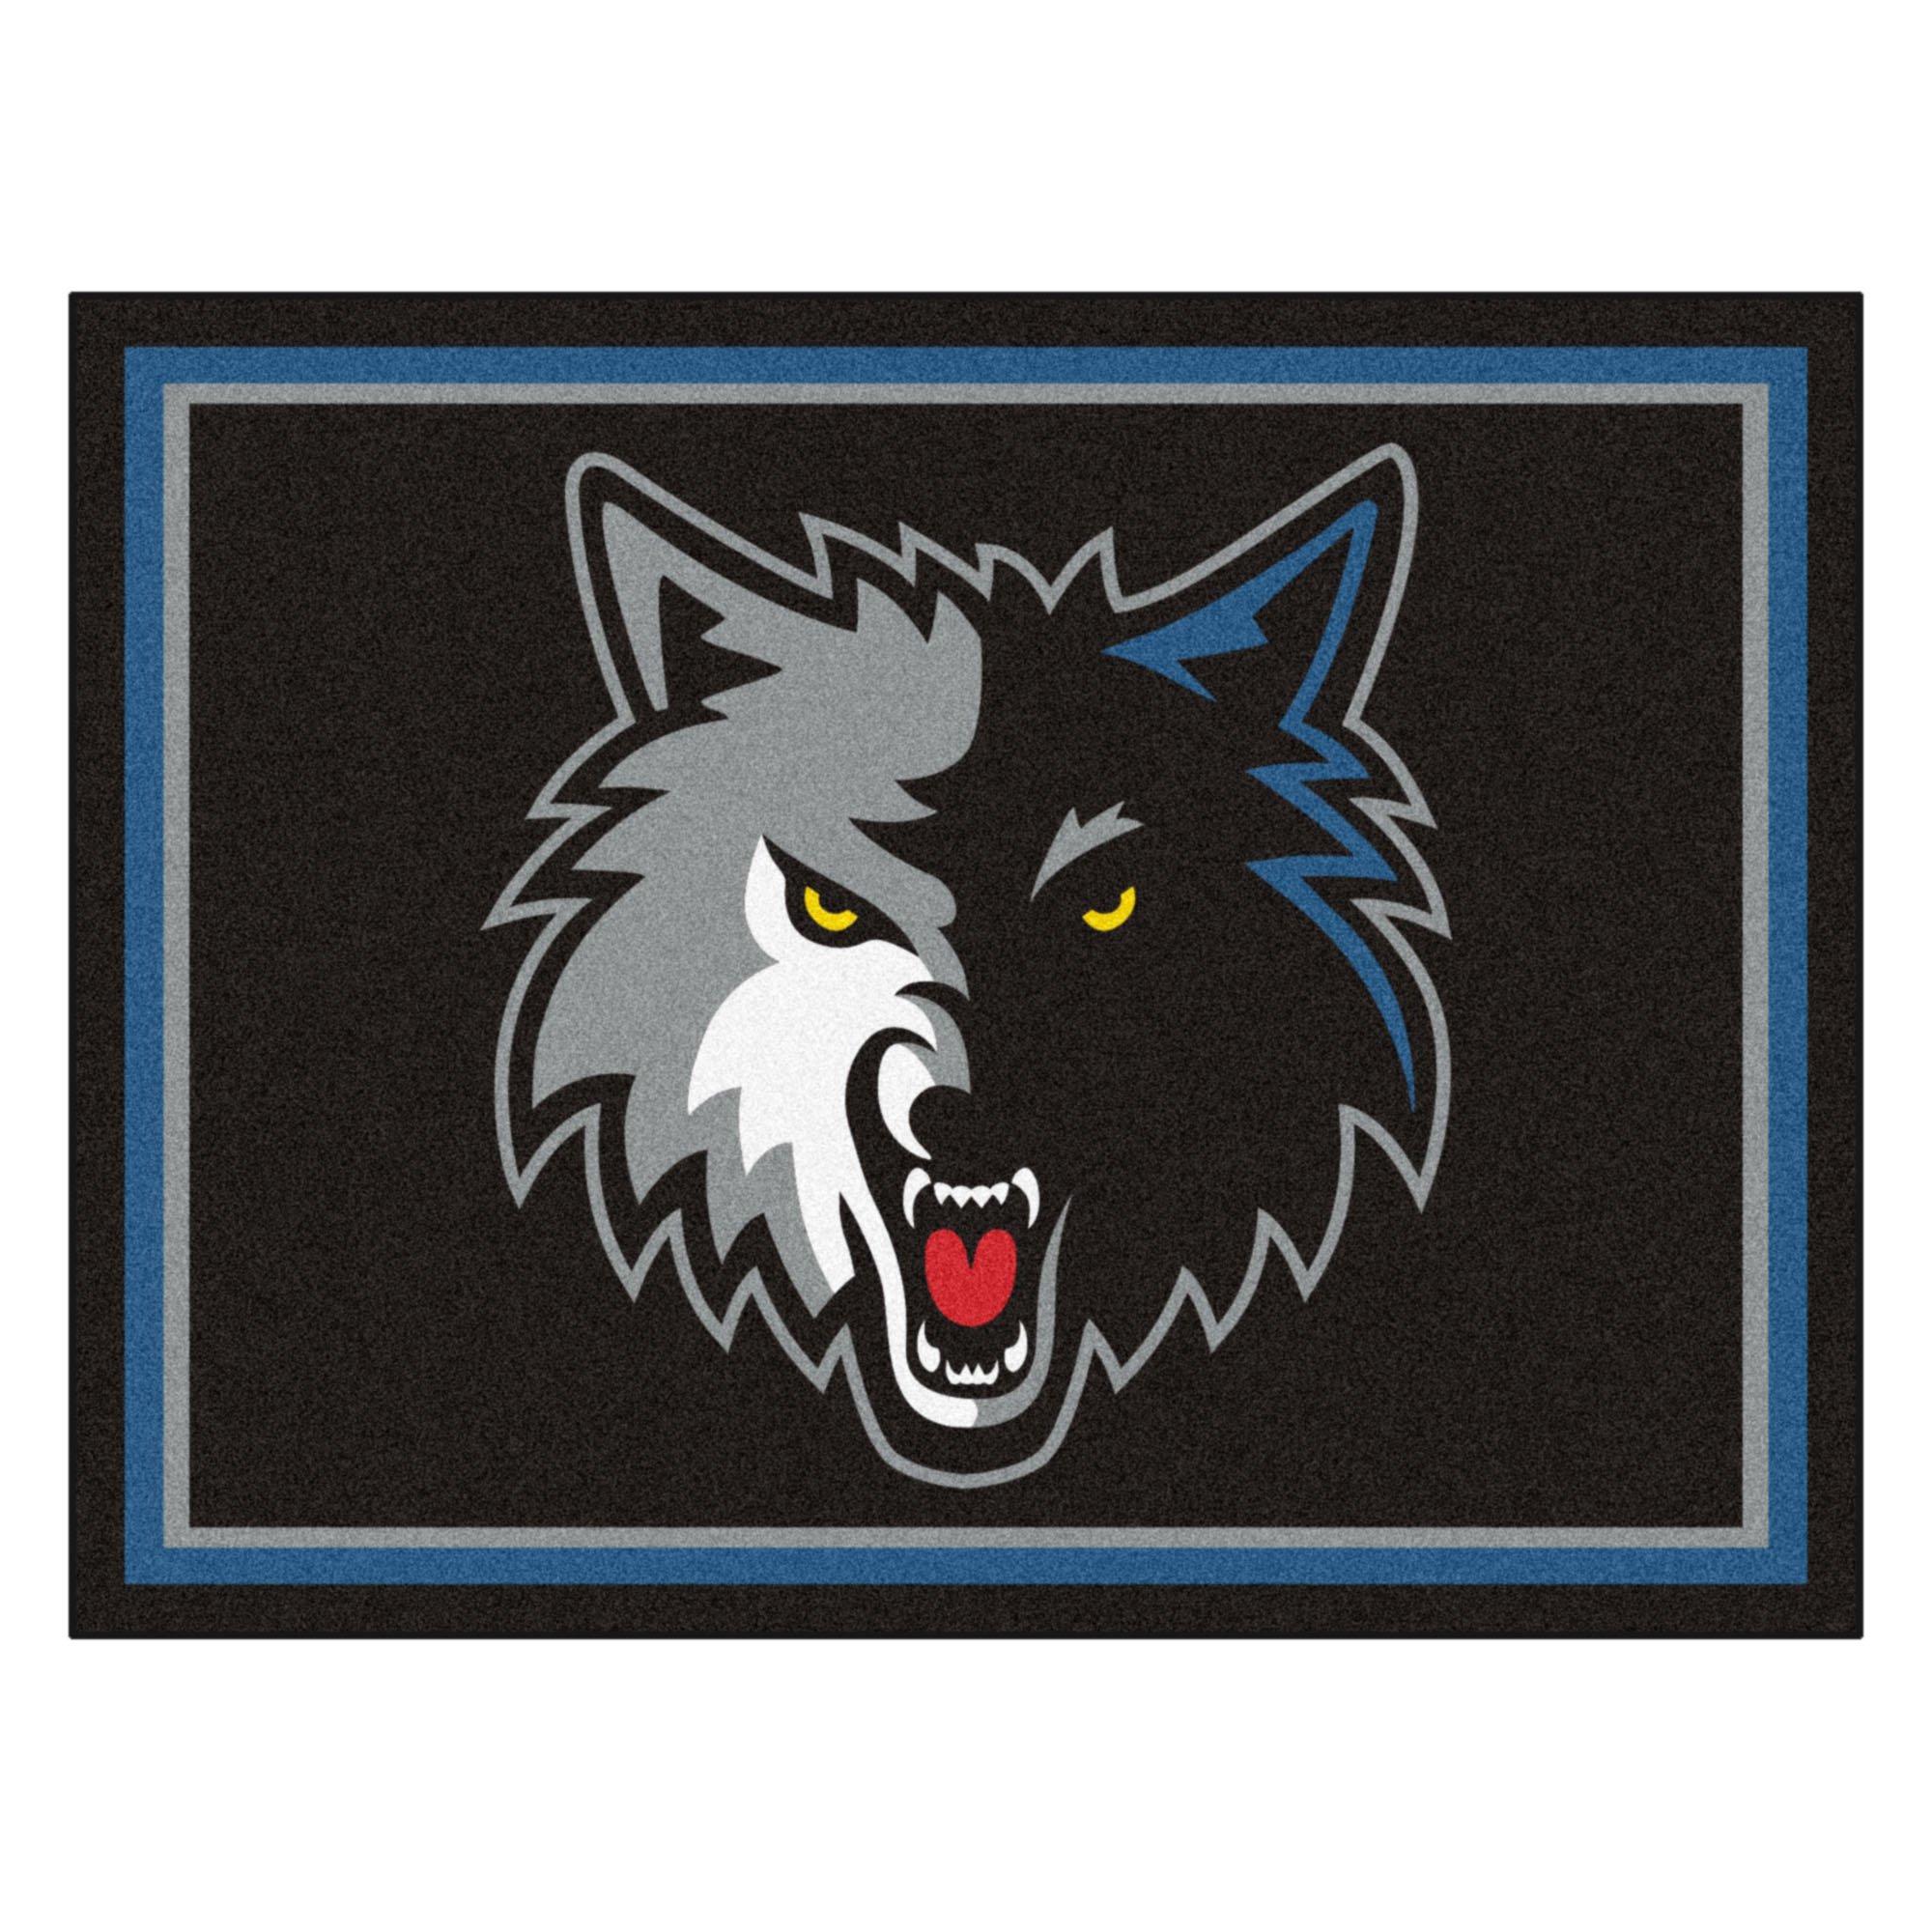 FANMATS 17459 NBA Minnesota Timberwolves Rug